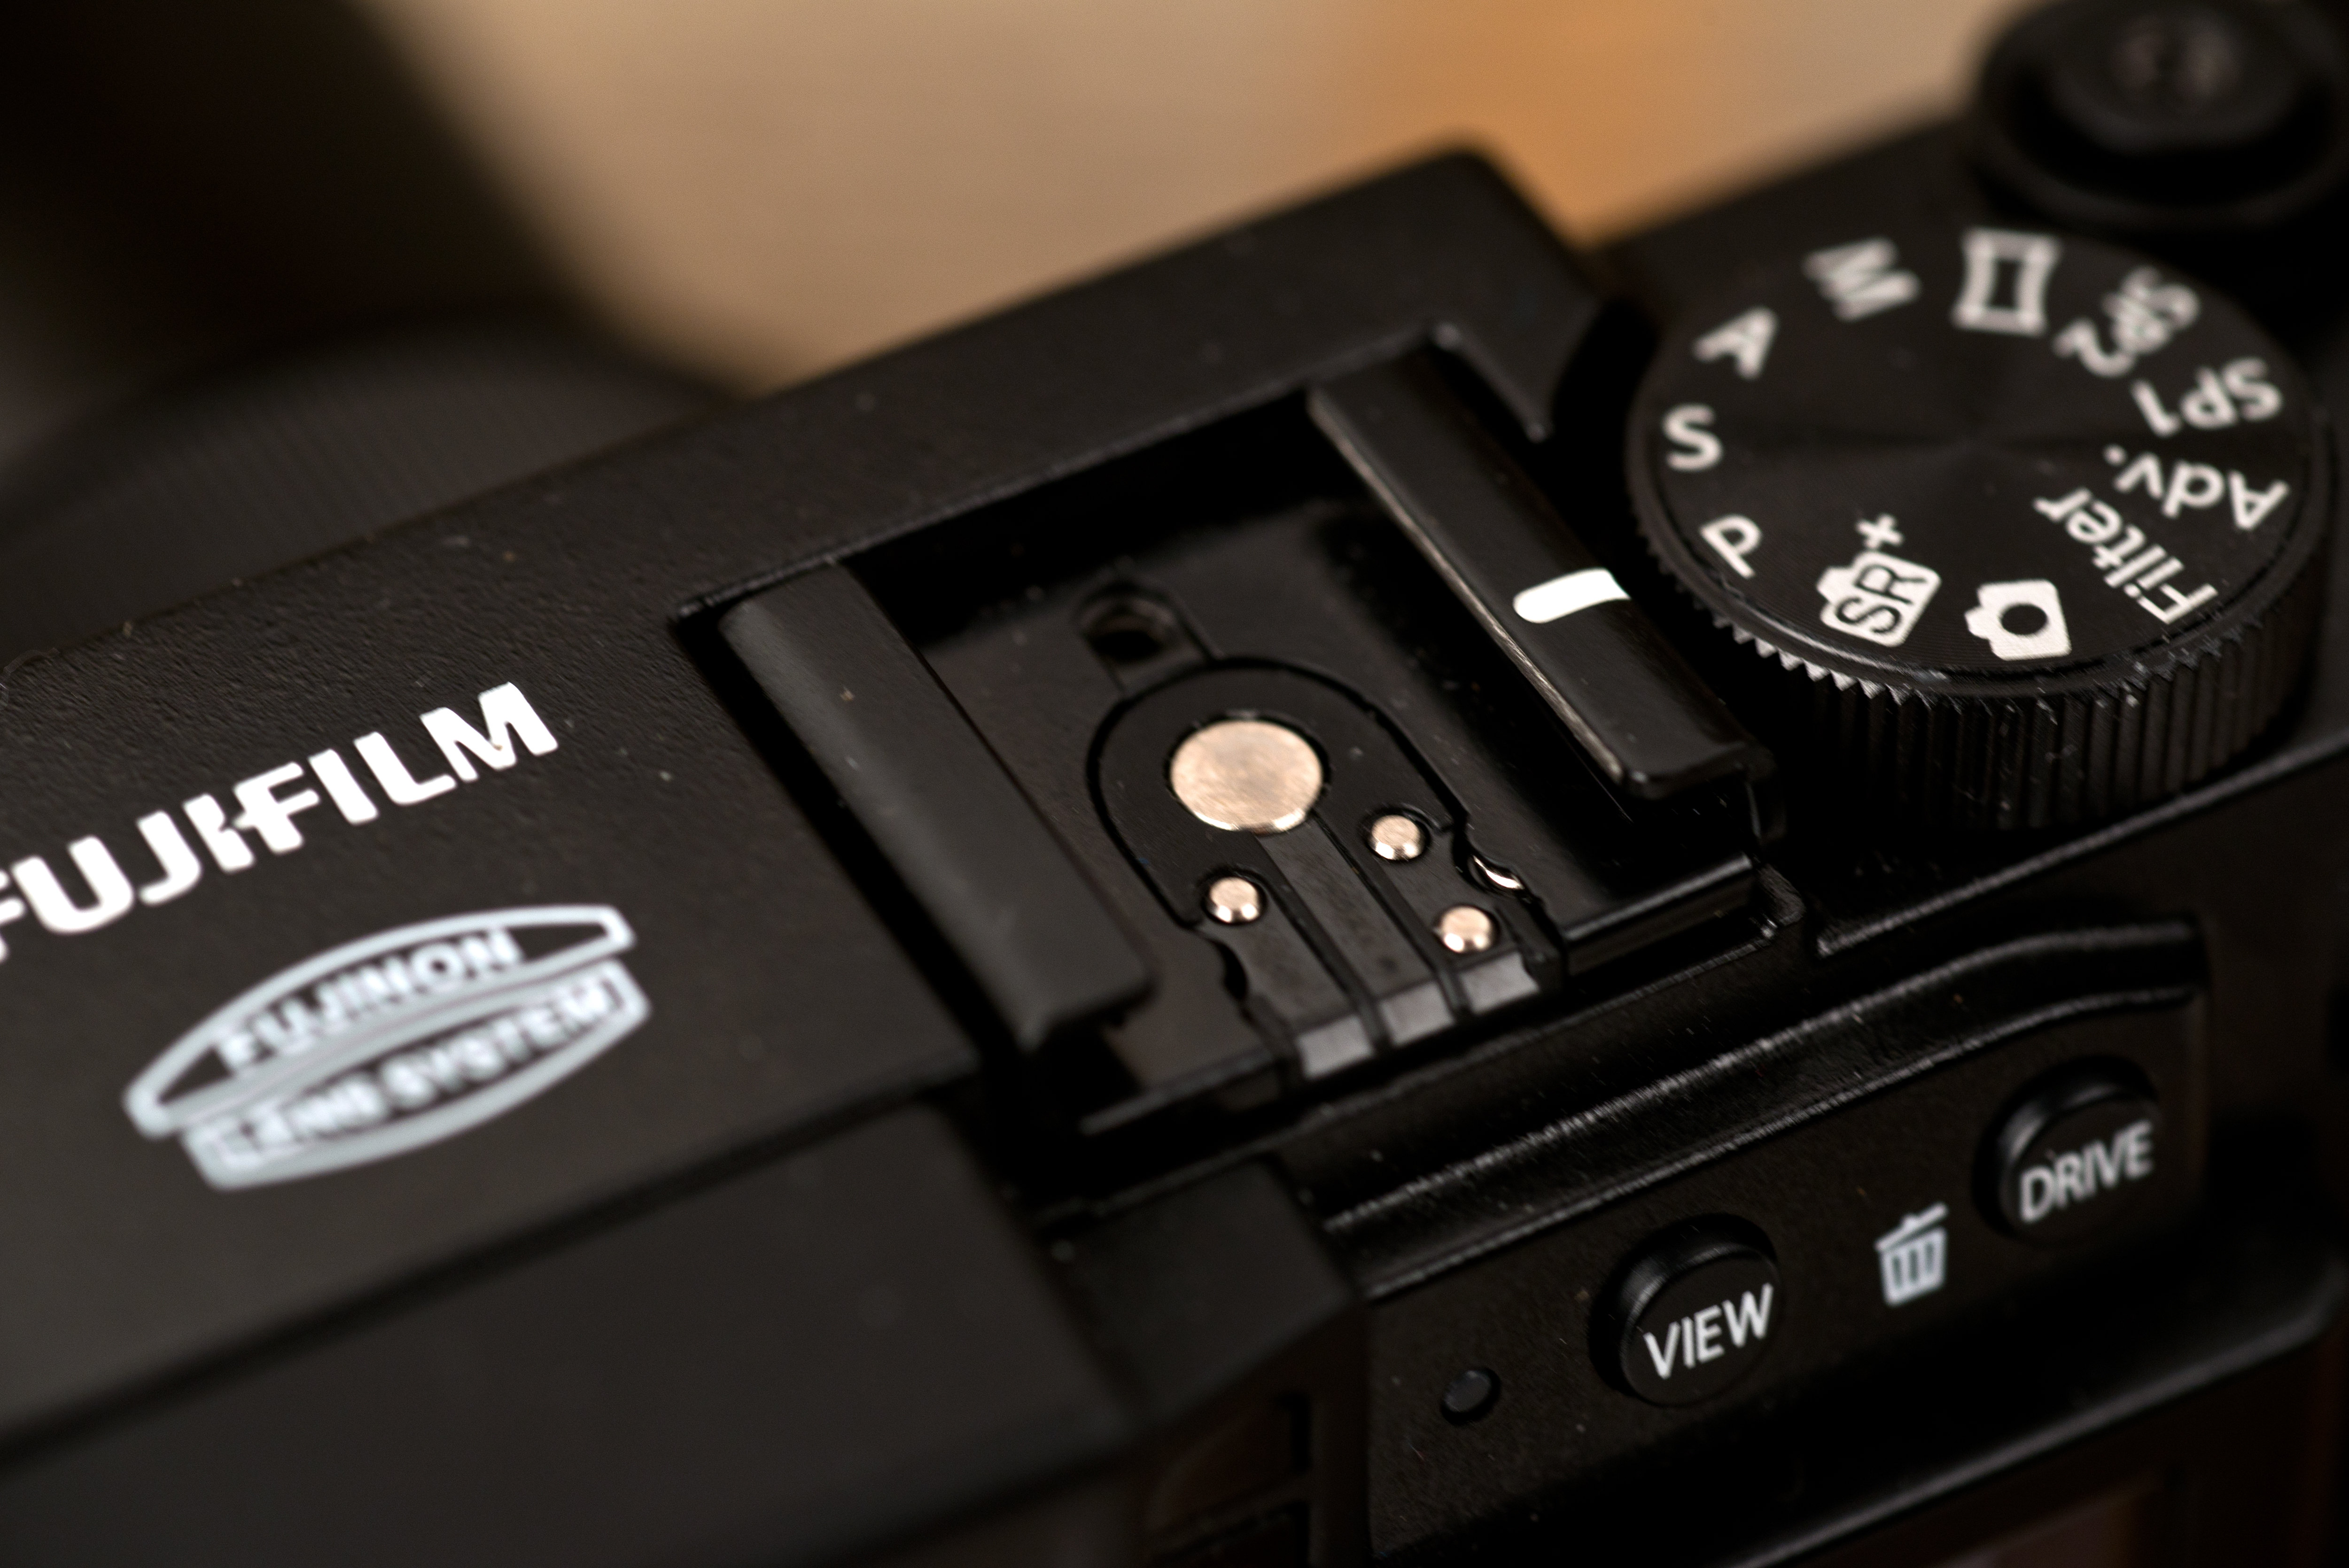 A photo of the Fujifilm X30's hot shoe.